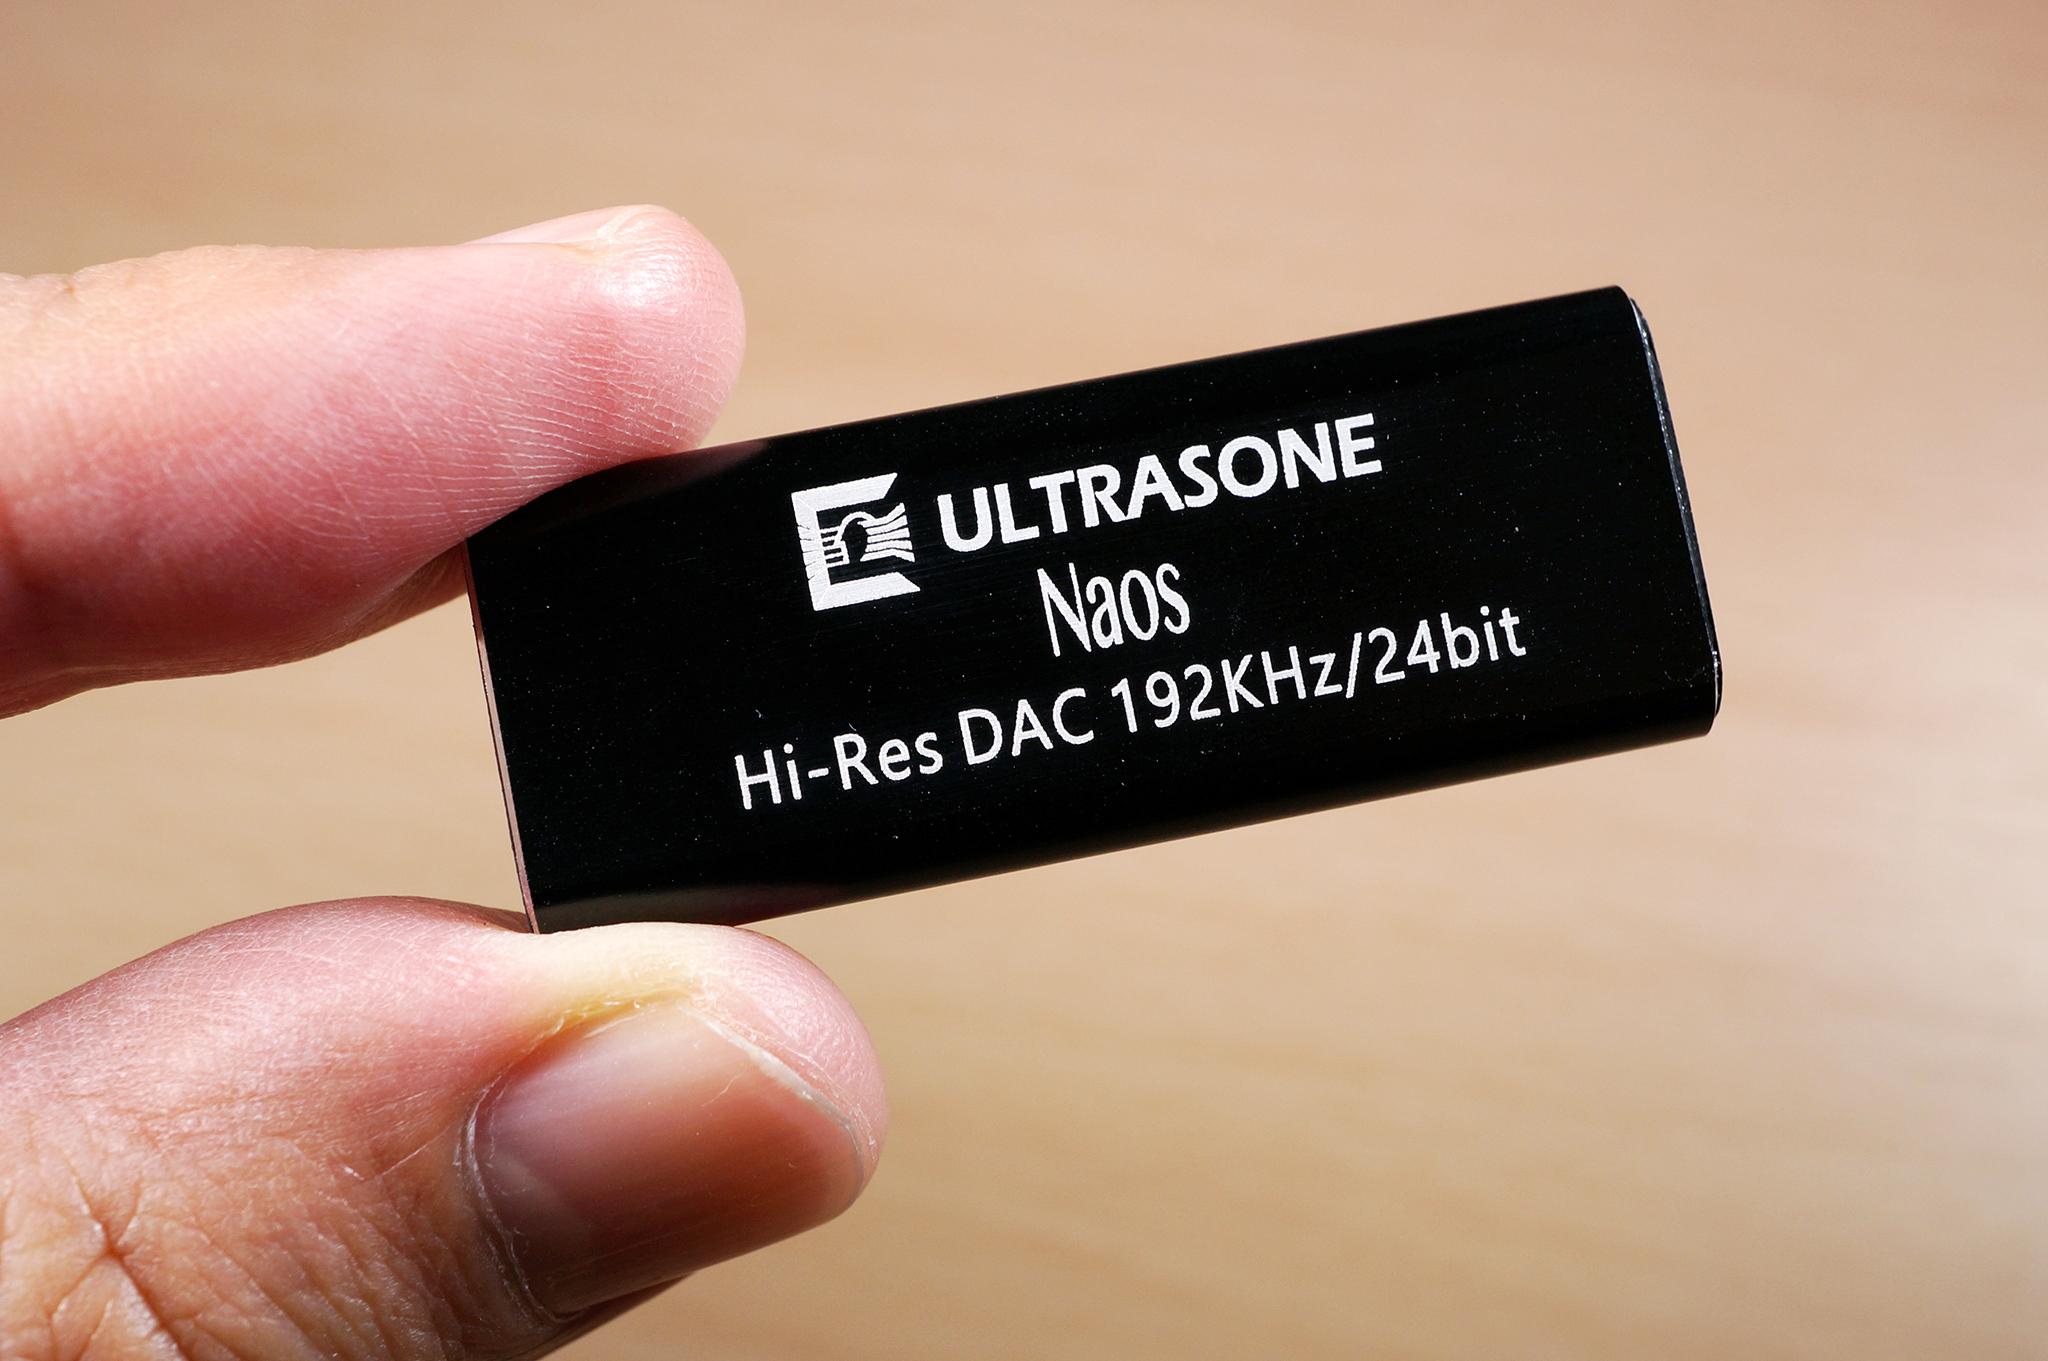 iPhone Xで妥協のない最高のハイレゾ音楽を!超小型で10g以下のUSB DAC!ULTRASONEのNaosがオススメ。